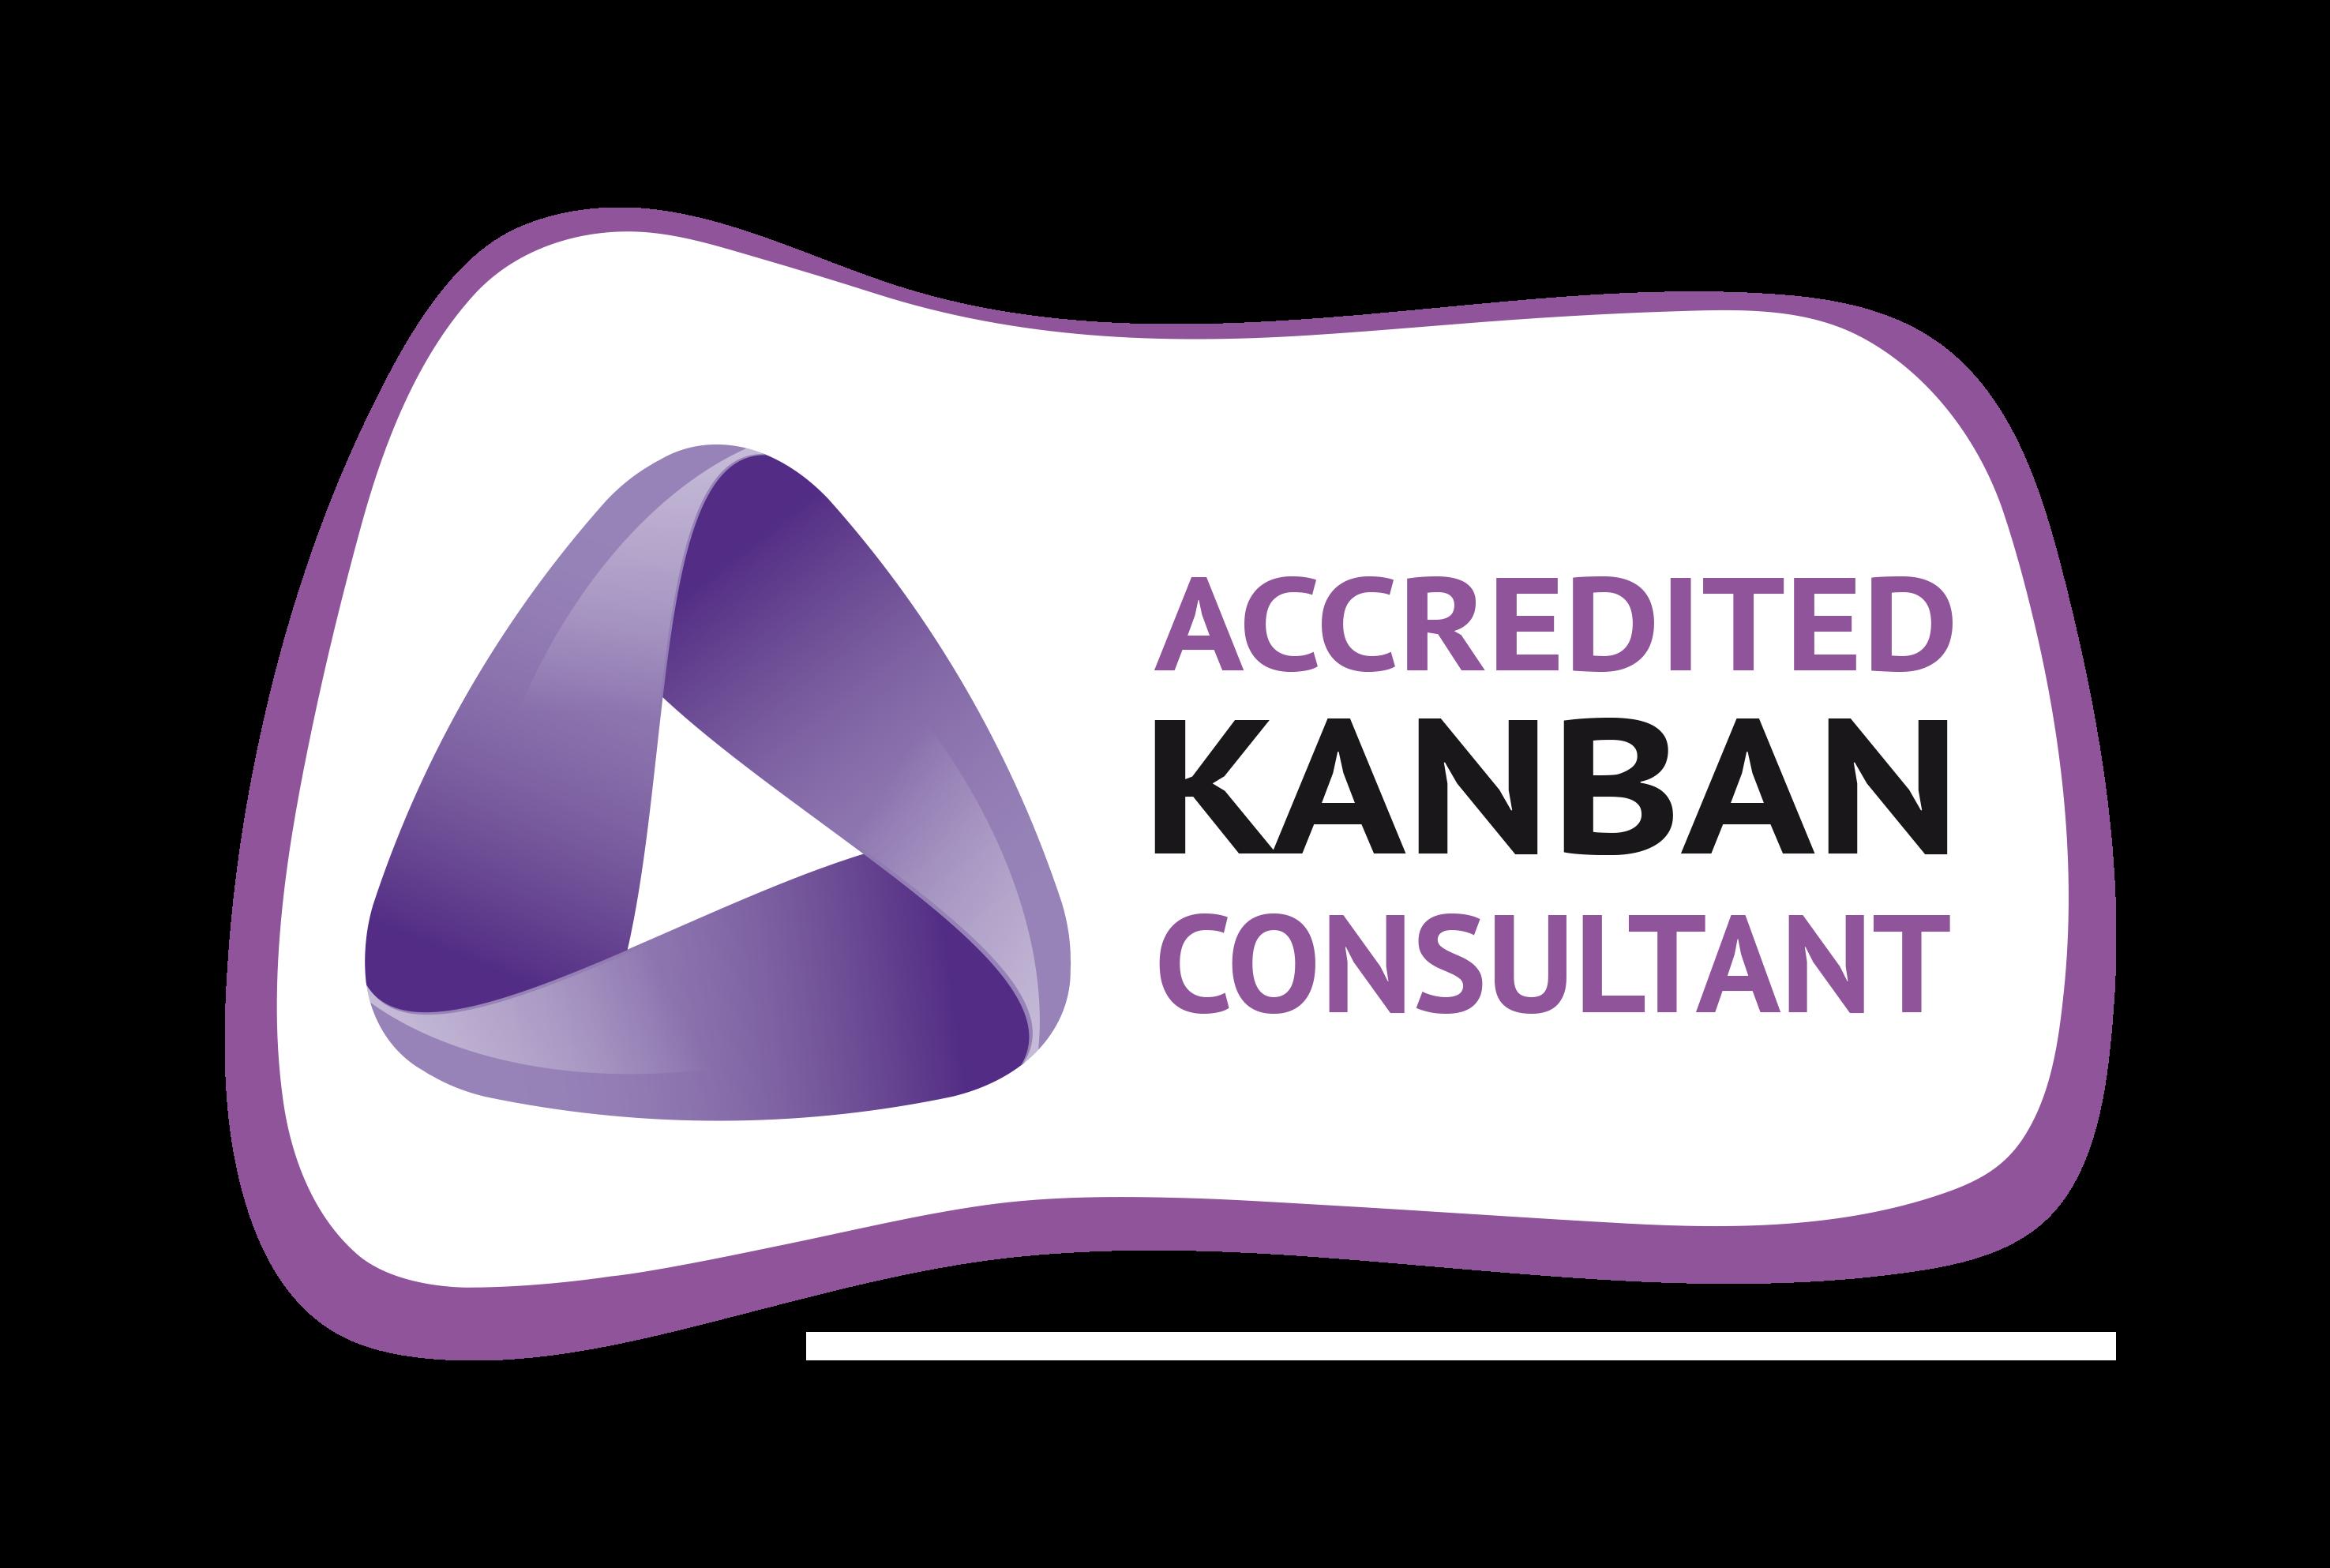 Distintivo Accredited Kanban Consultant